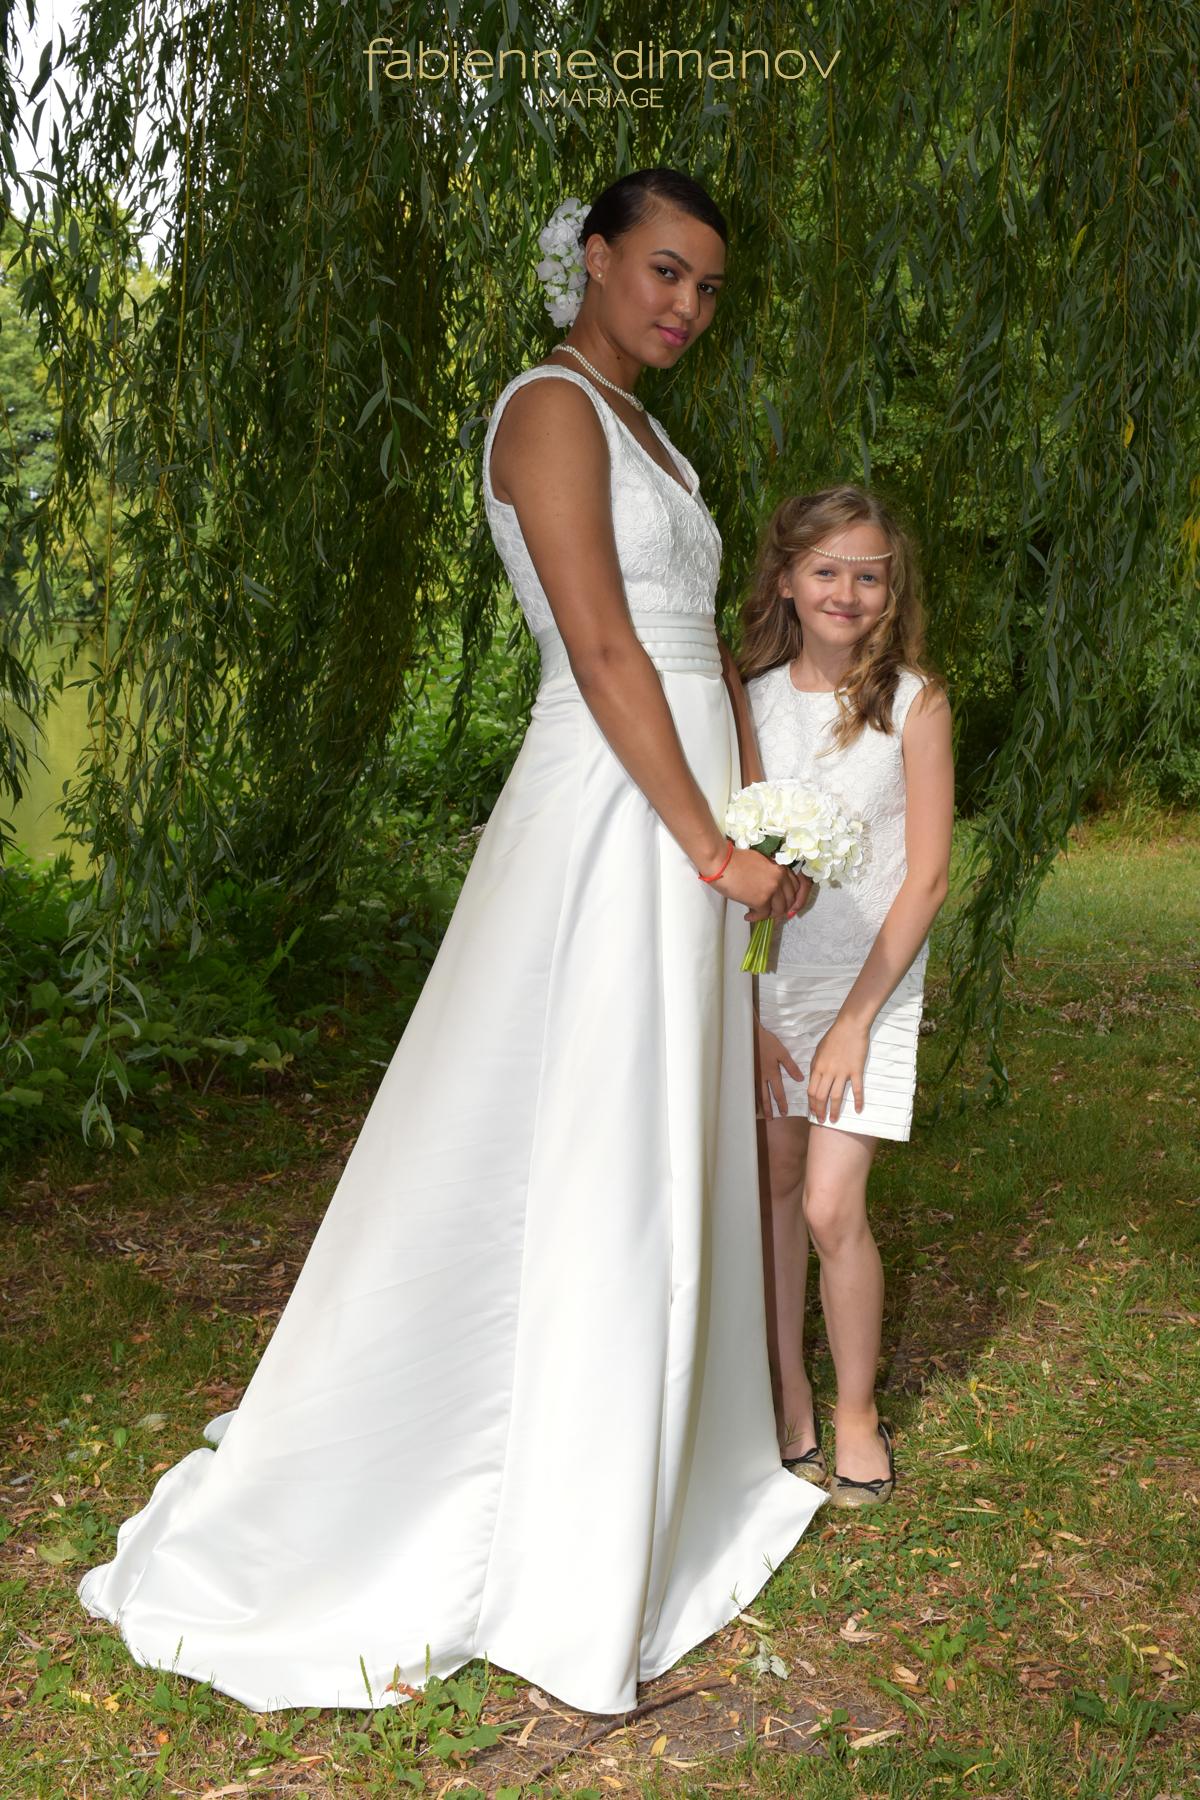 Vesta & Petite Perle - Fabienne Dimanov mariage